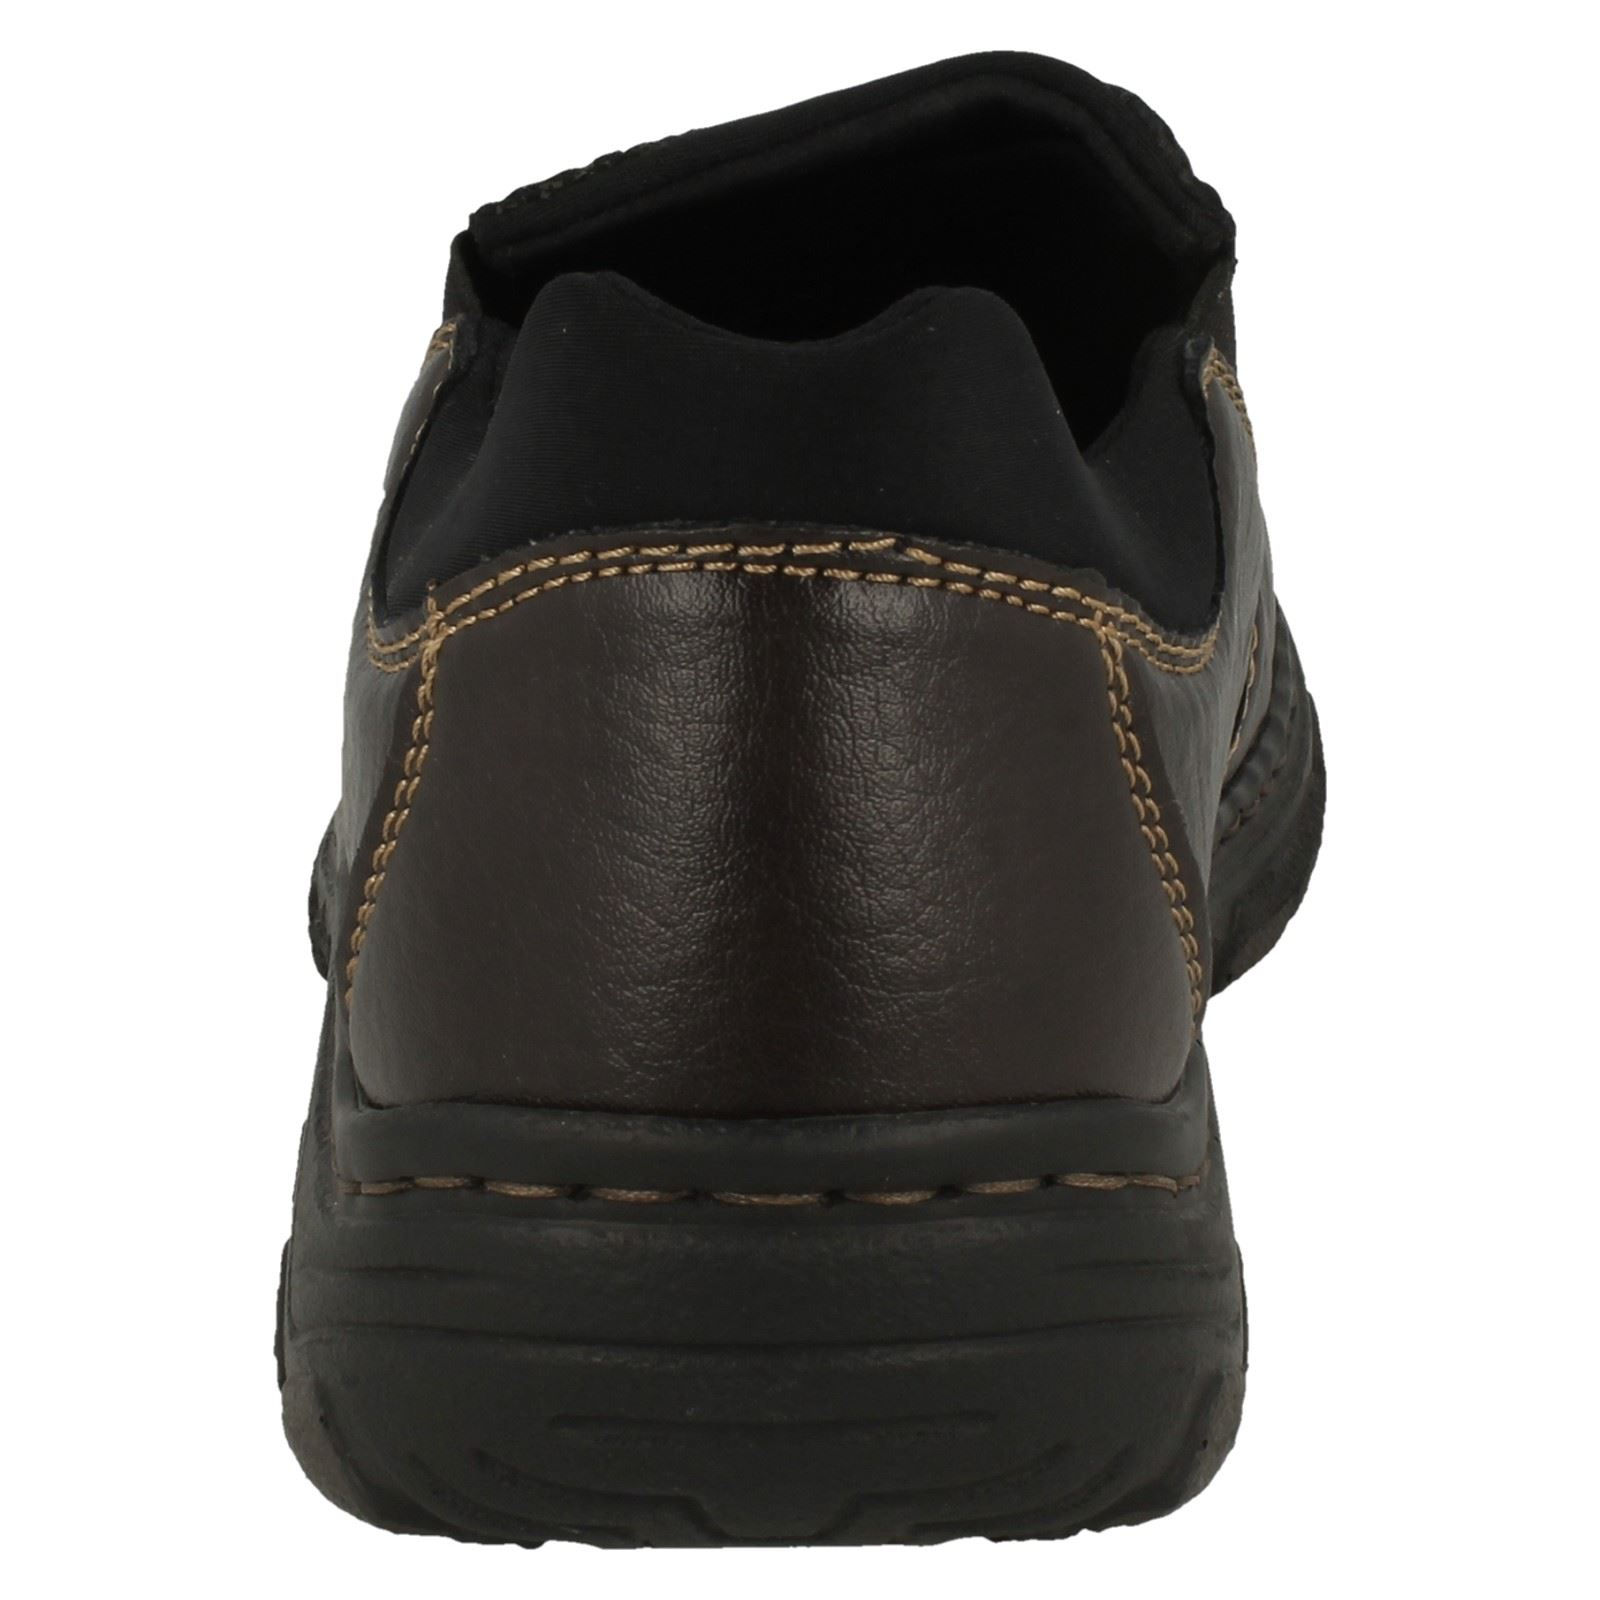 Uomo Rieker 19961 Casual Casual 19961 Schuhes 53e40b